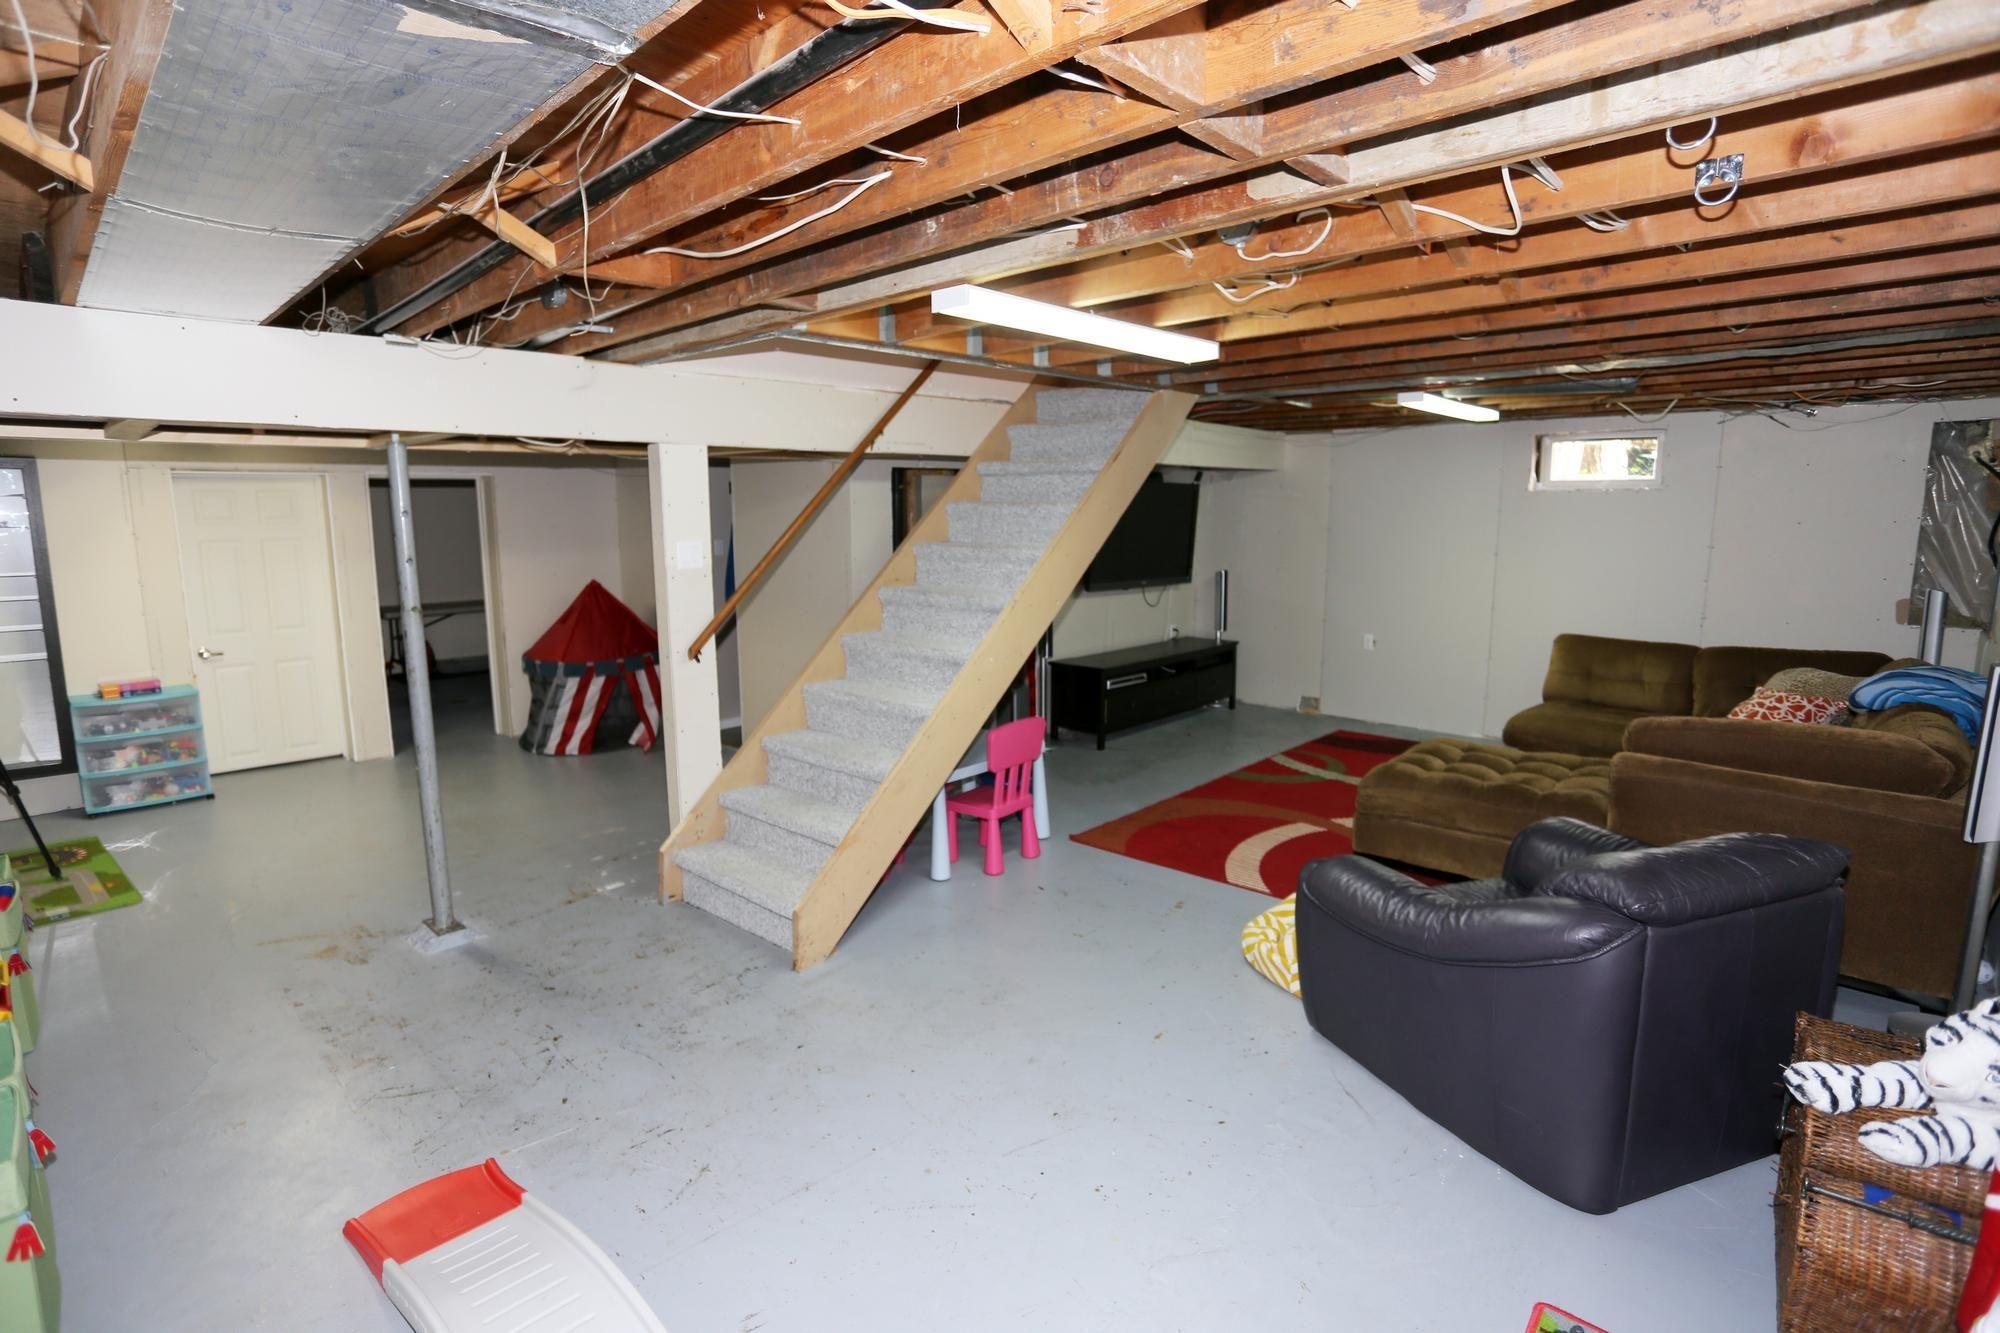 Photo 24: Photos: 1322 Valour Road in Winnipeg: Sargent Park Single Family Detached for sale (5C)  : MLS®# 1811835